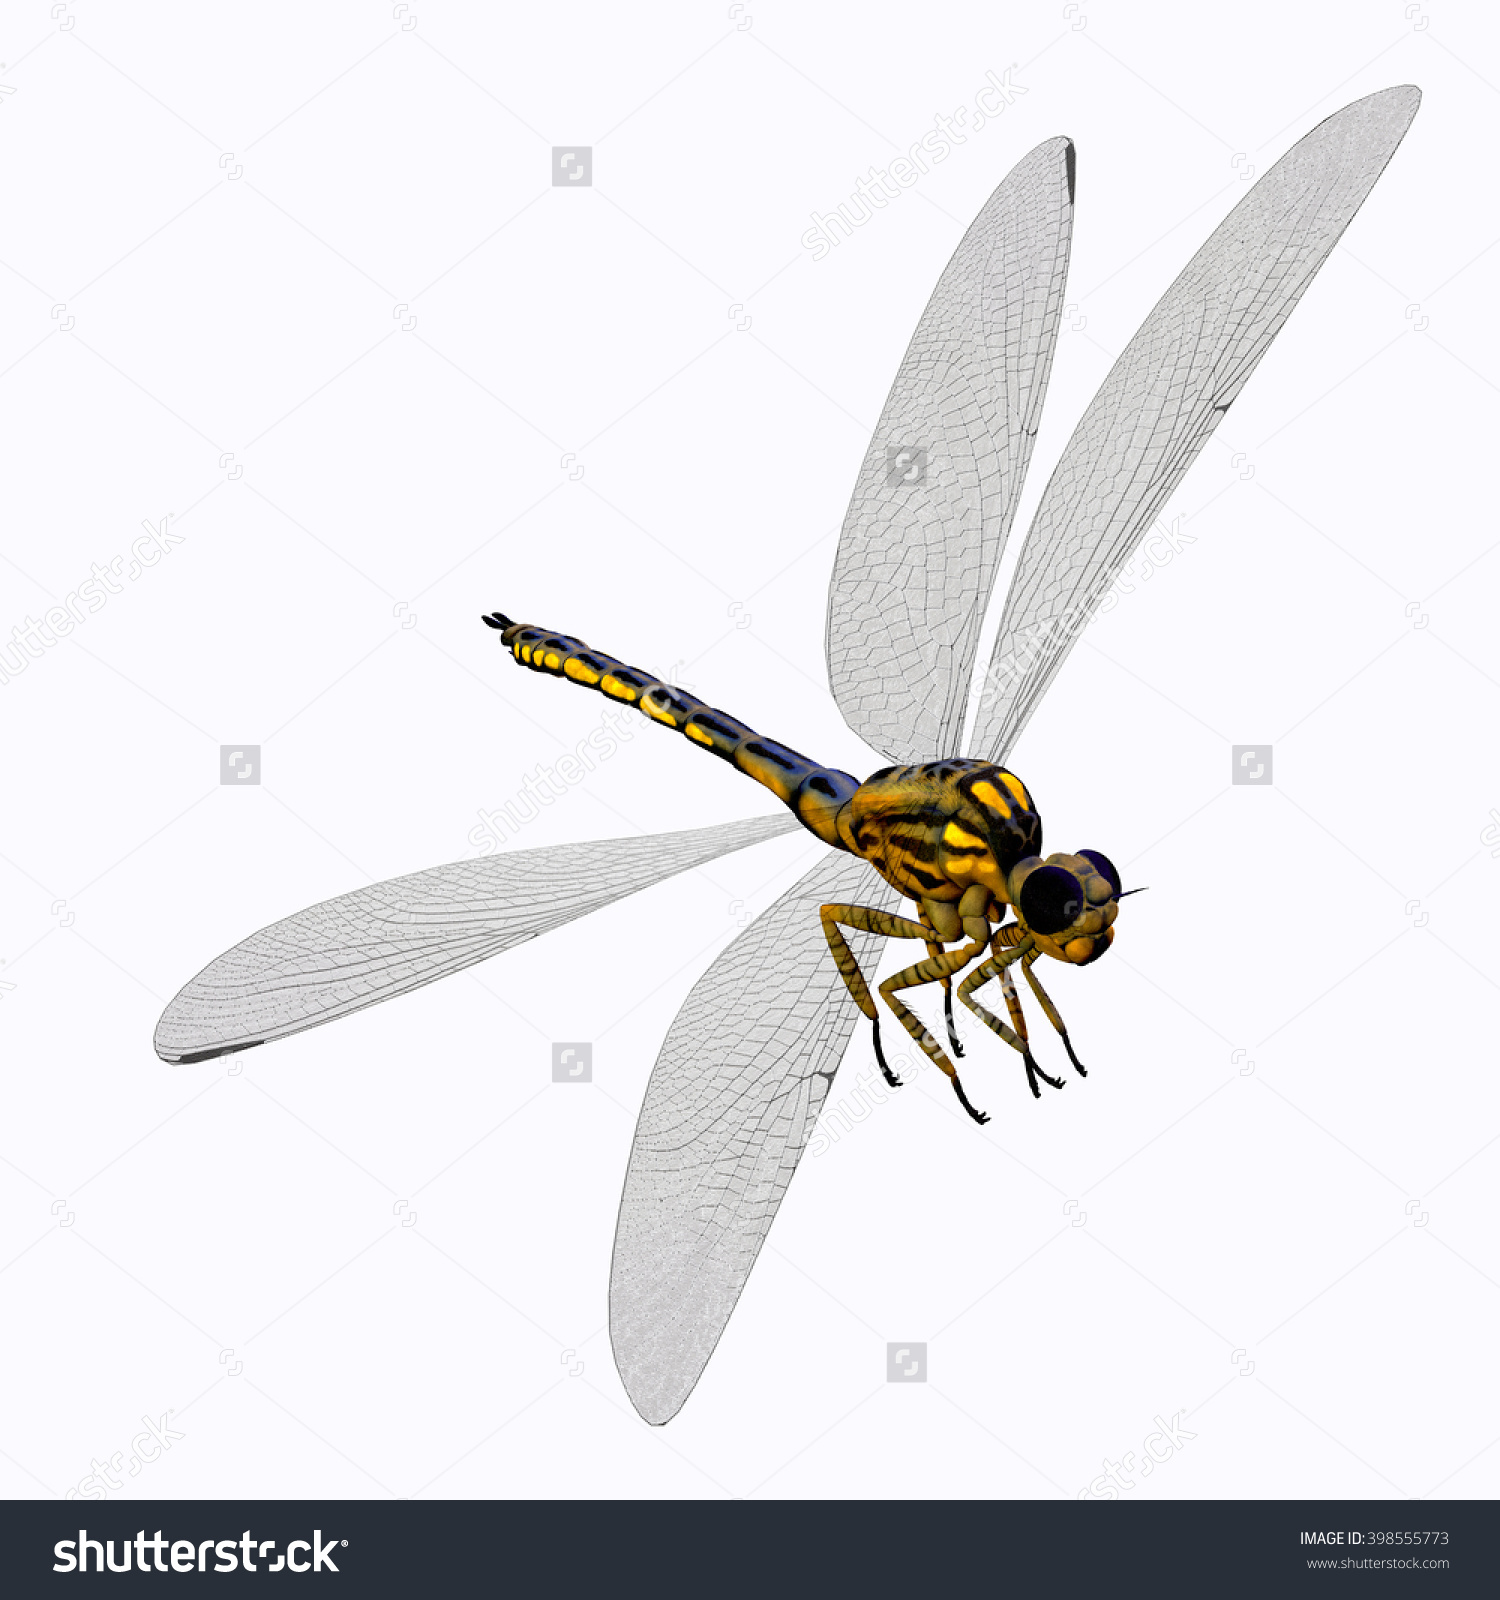 Meganeura Dragonfly Body 3d Illustration.